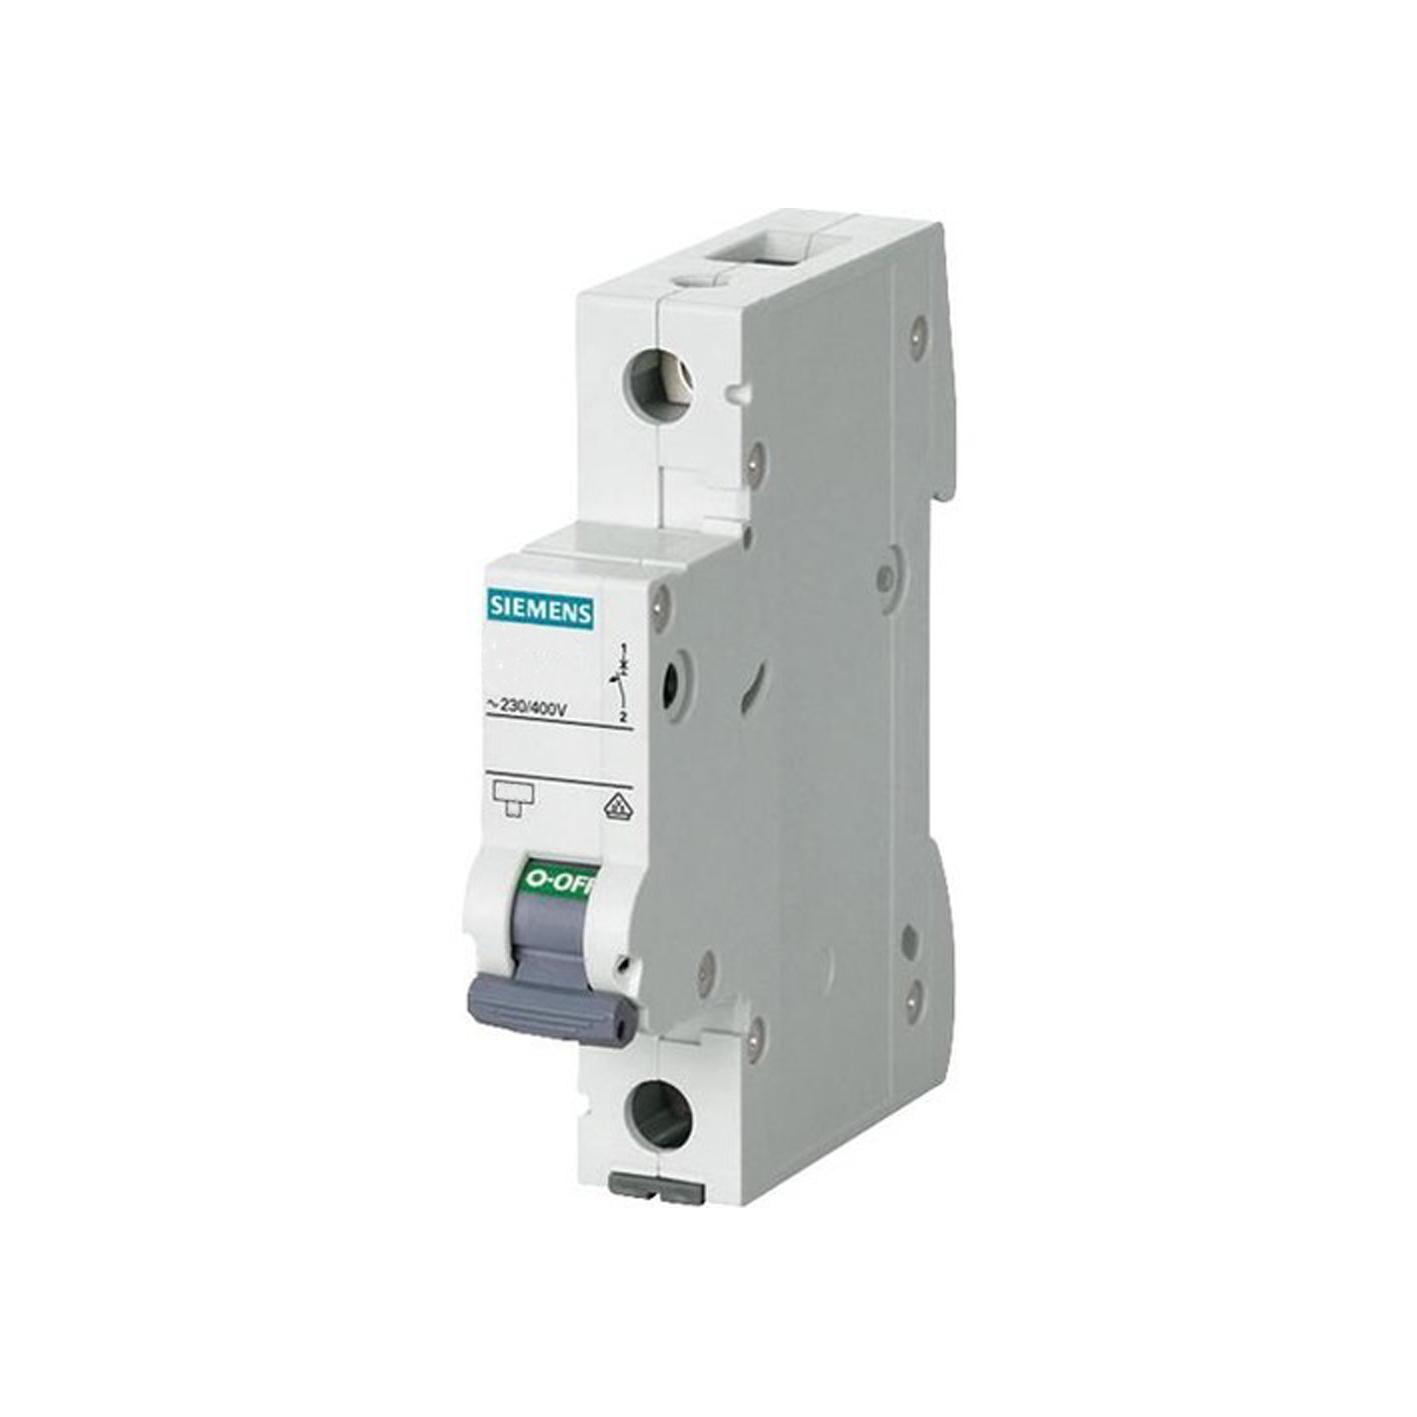 Siemens 1x3A Otomatik Sigorta